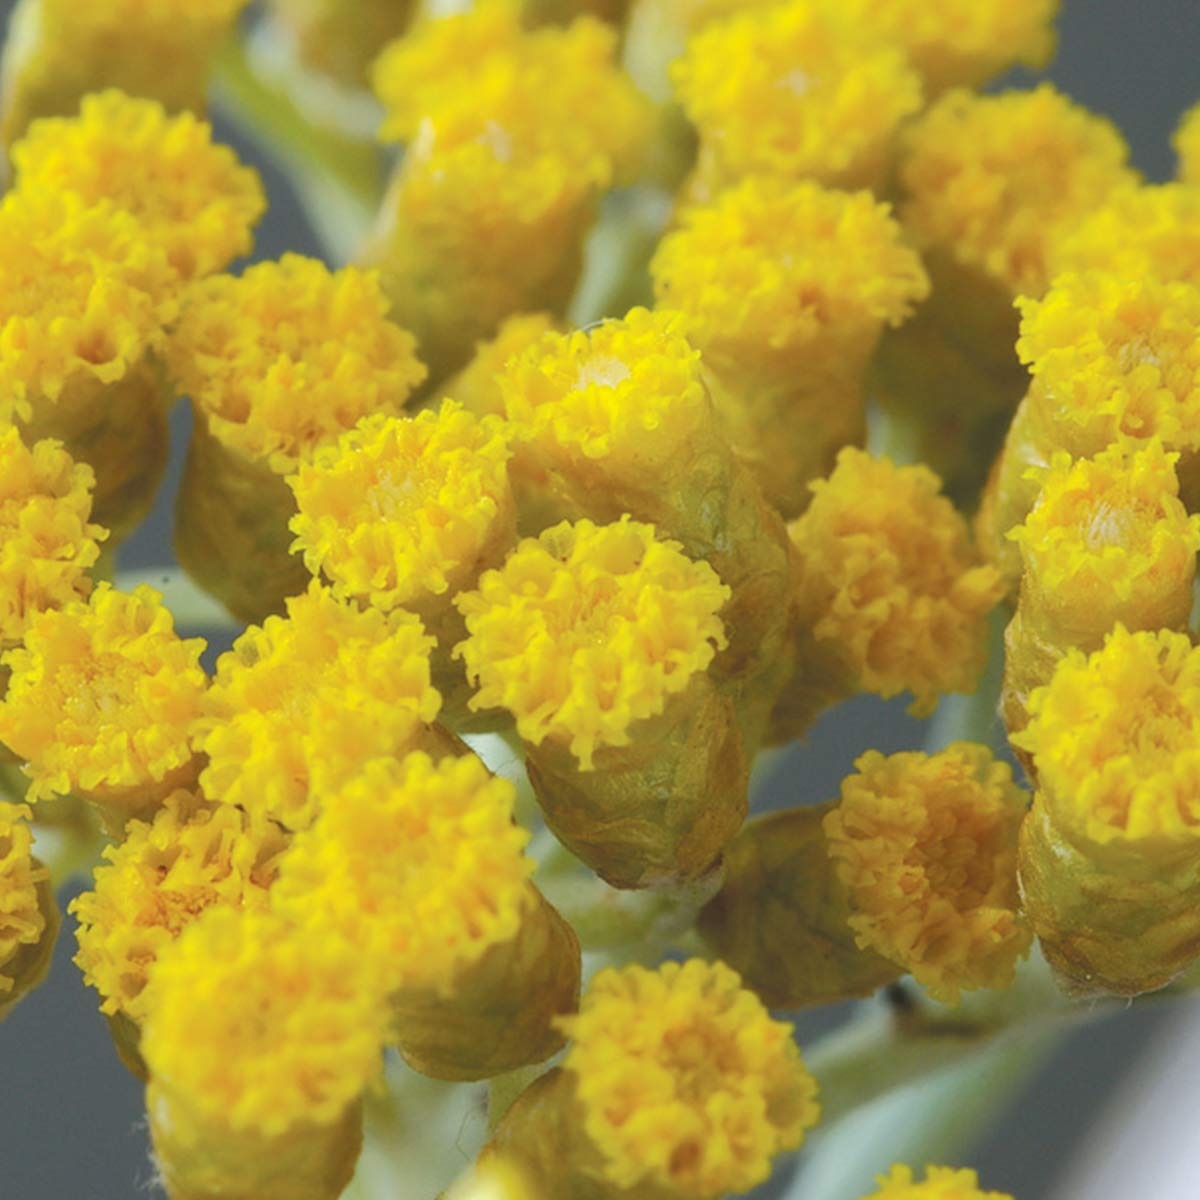 PRANAROM - Certified USDA and ECOCERT Organic Helichrysum (Helichrysum italicum) Essential Oil 15ml